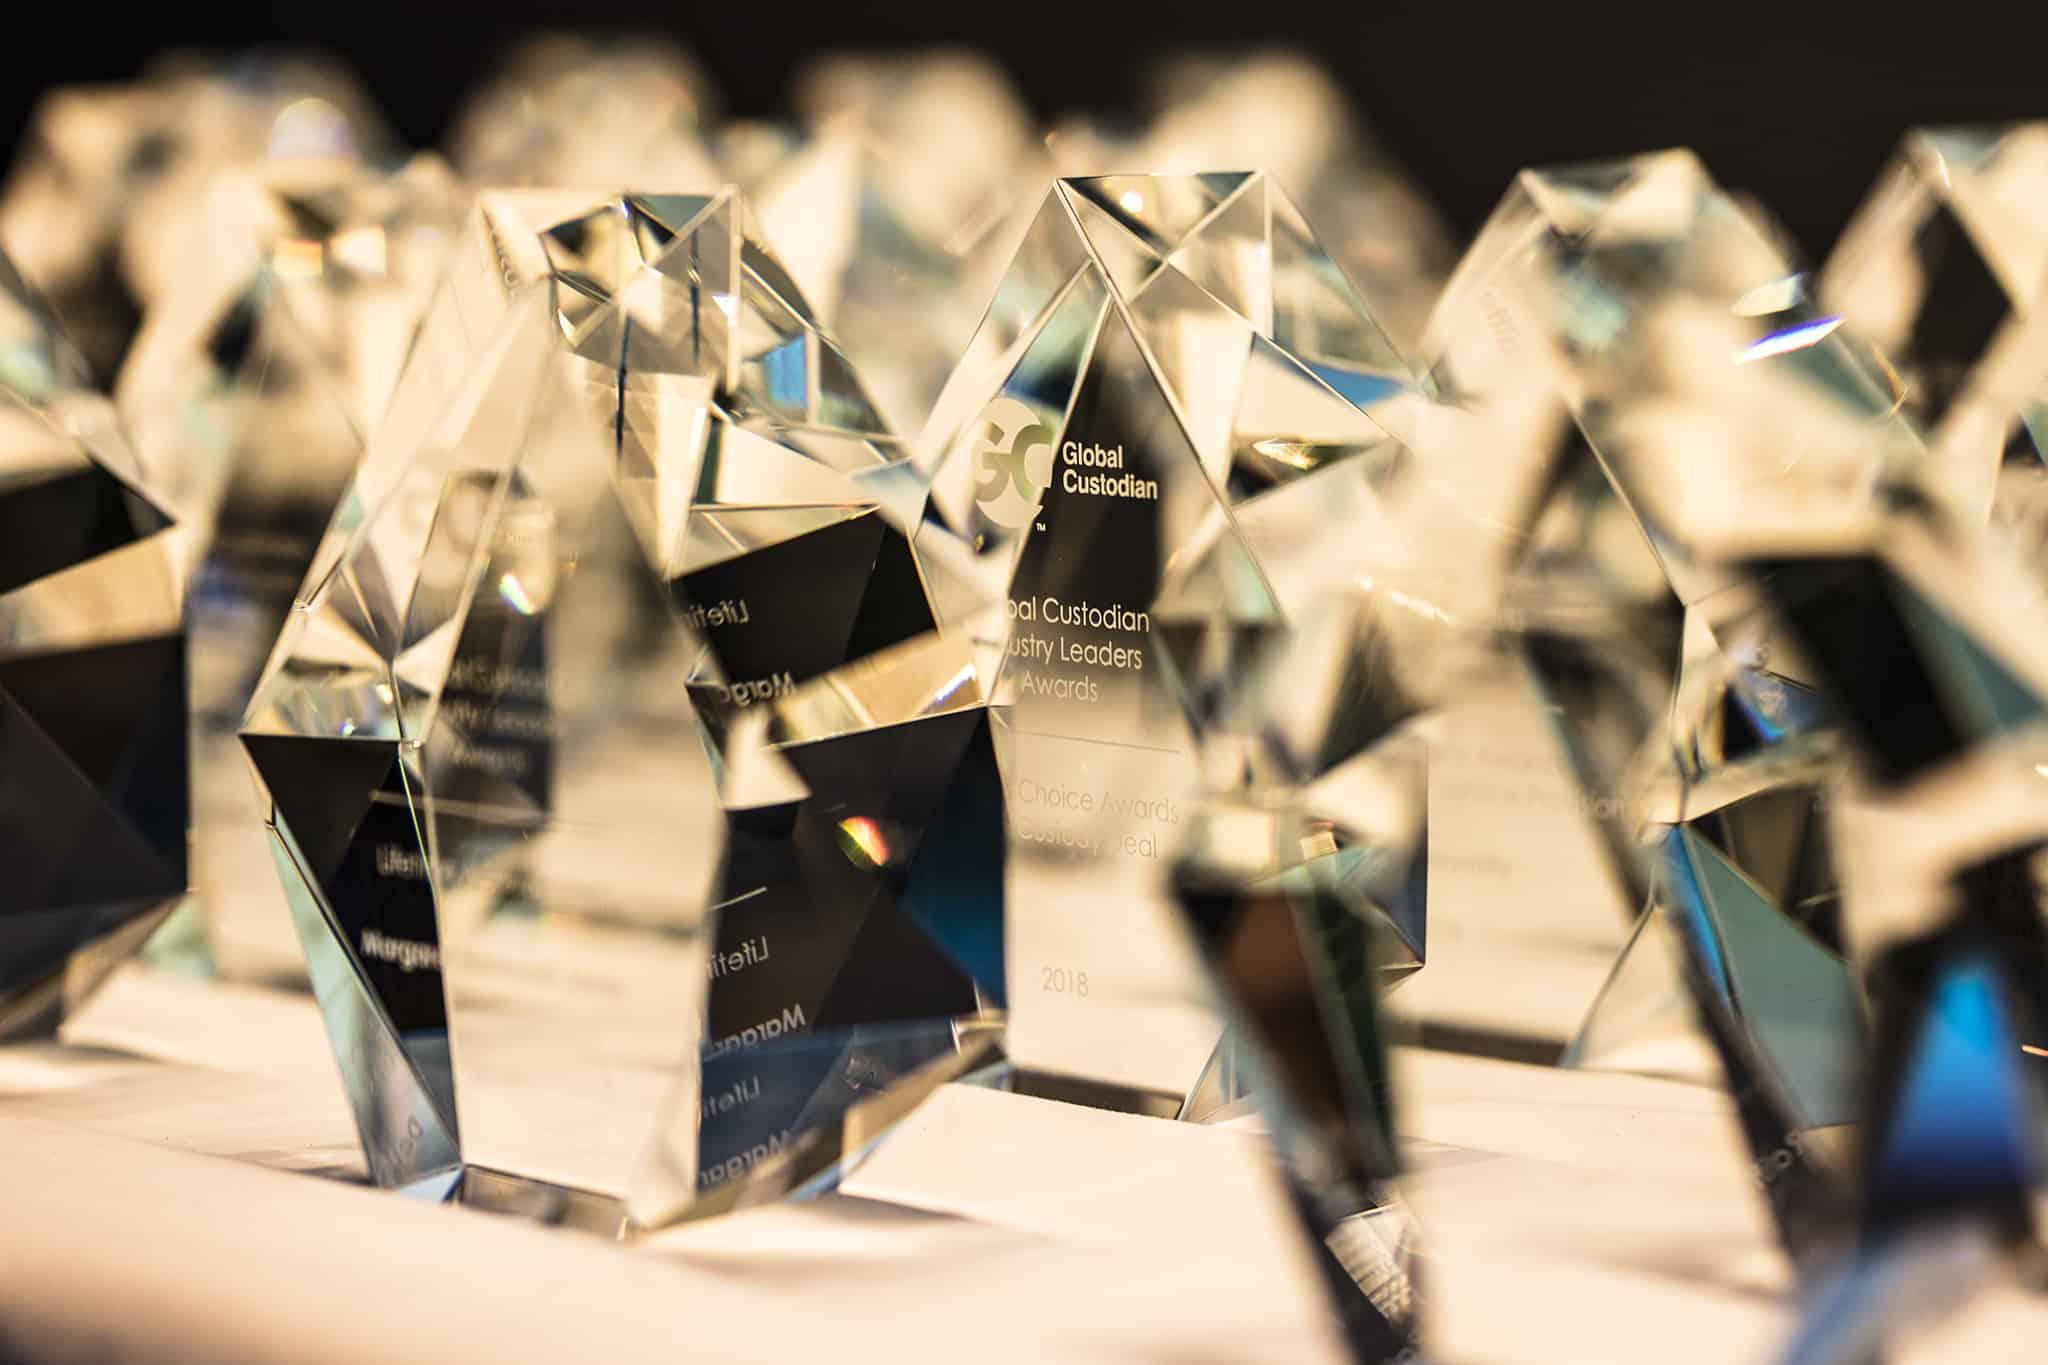 Global Custodian's Industry Leaders award winners announced